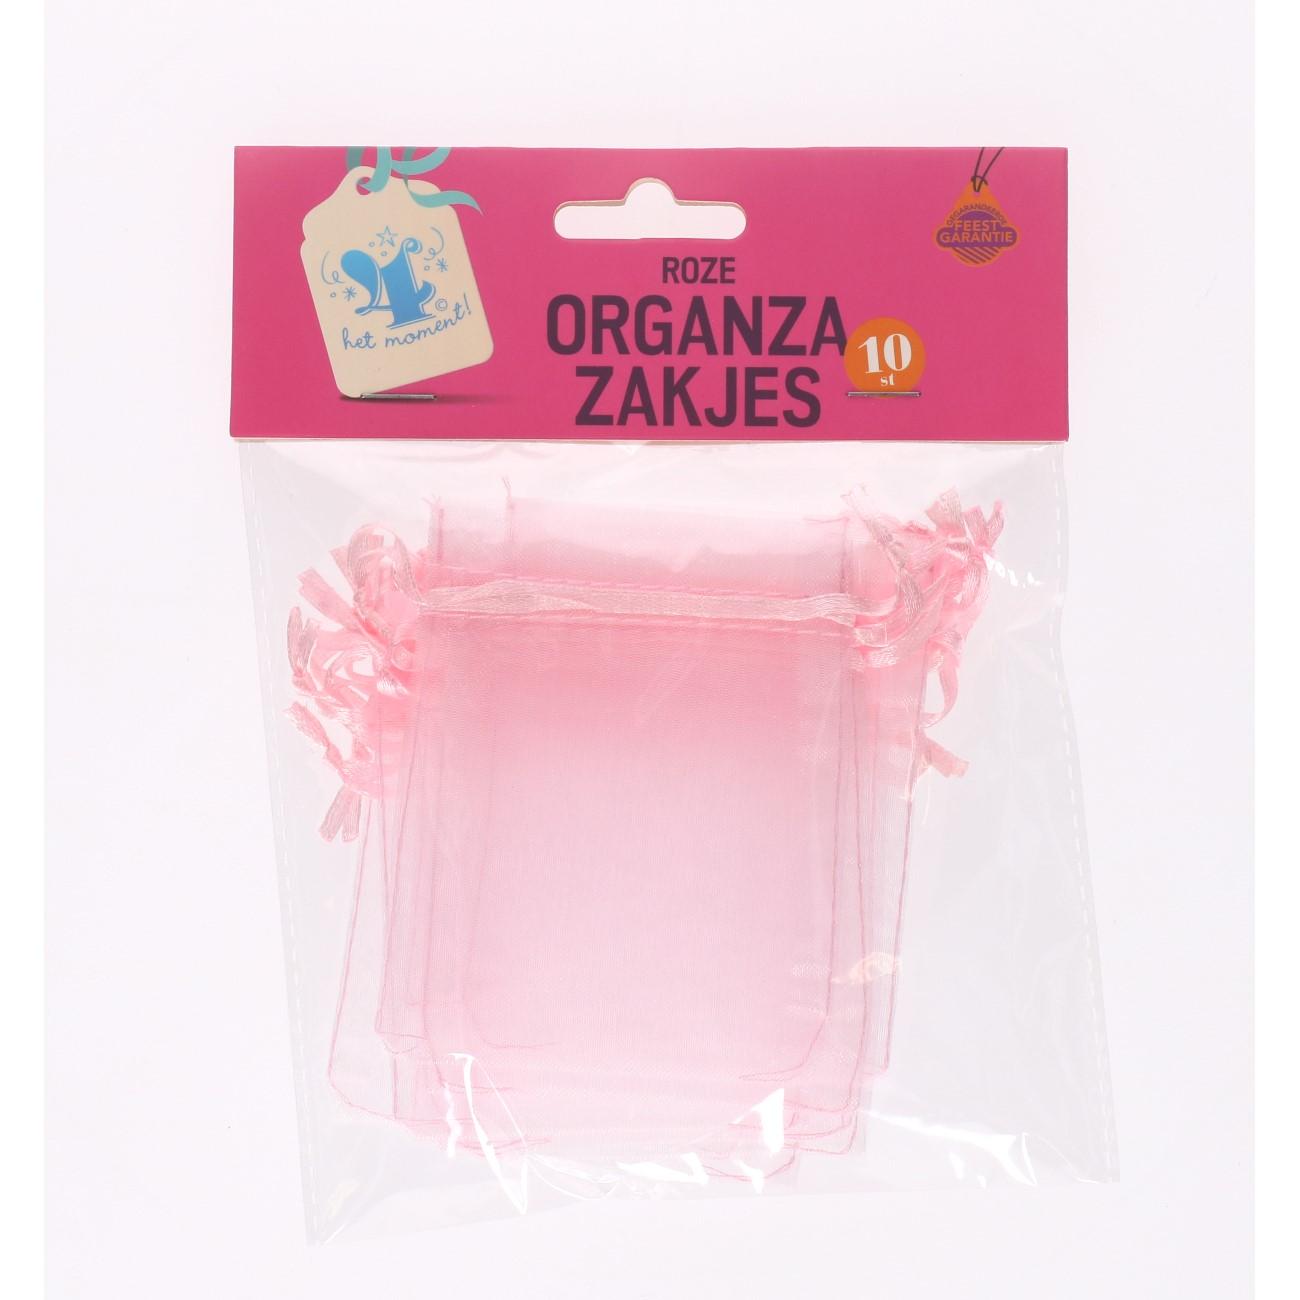 Organza zakjes roze 10 stuks